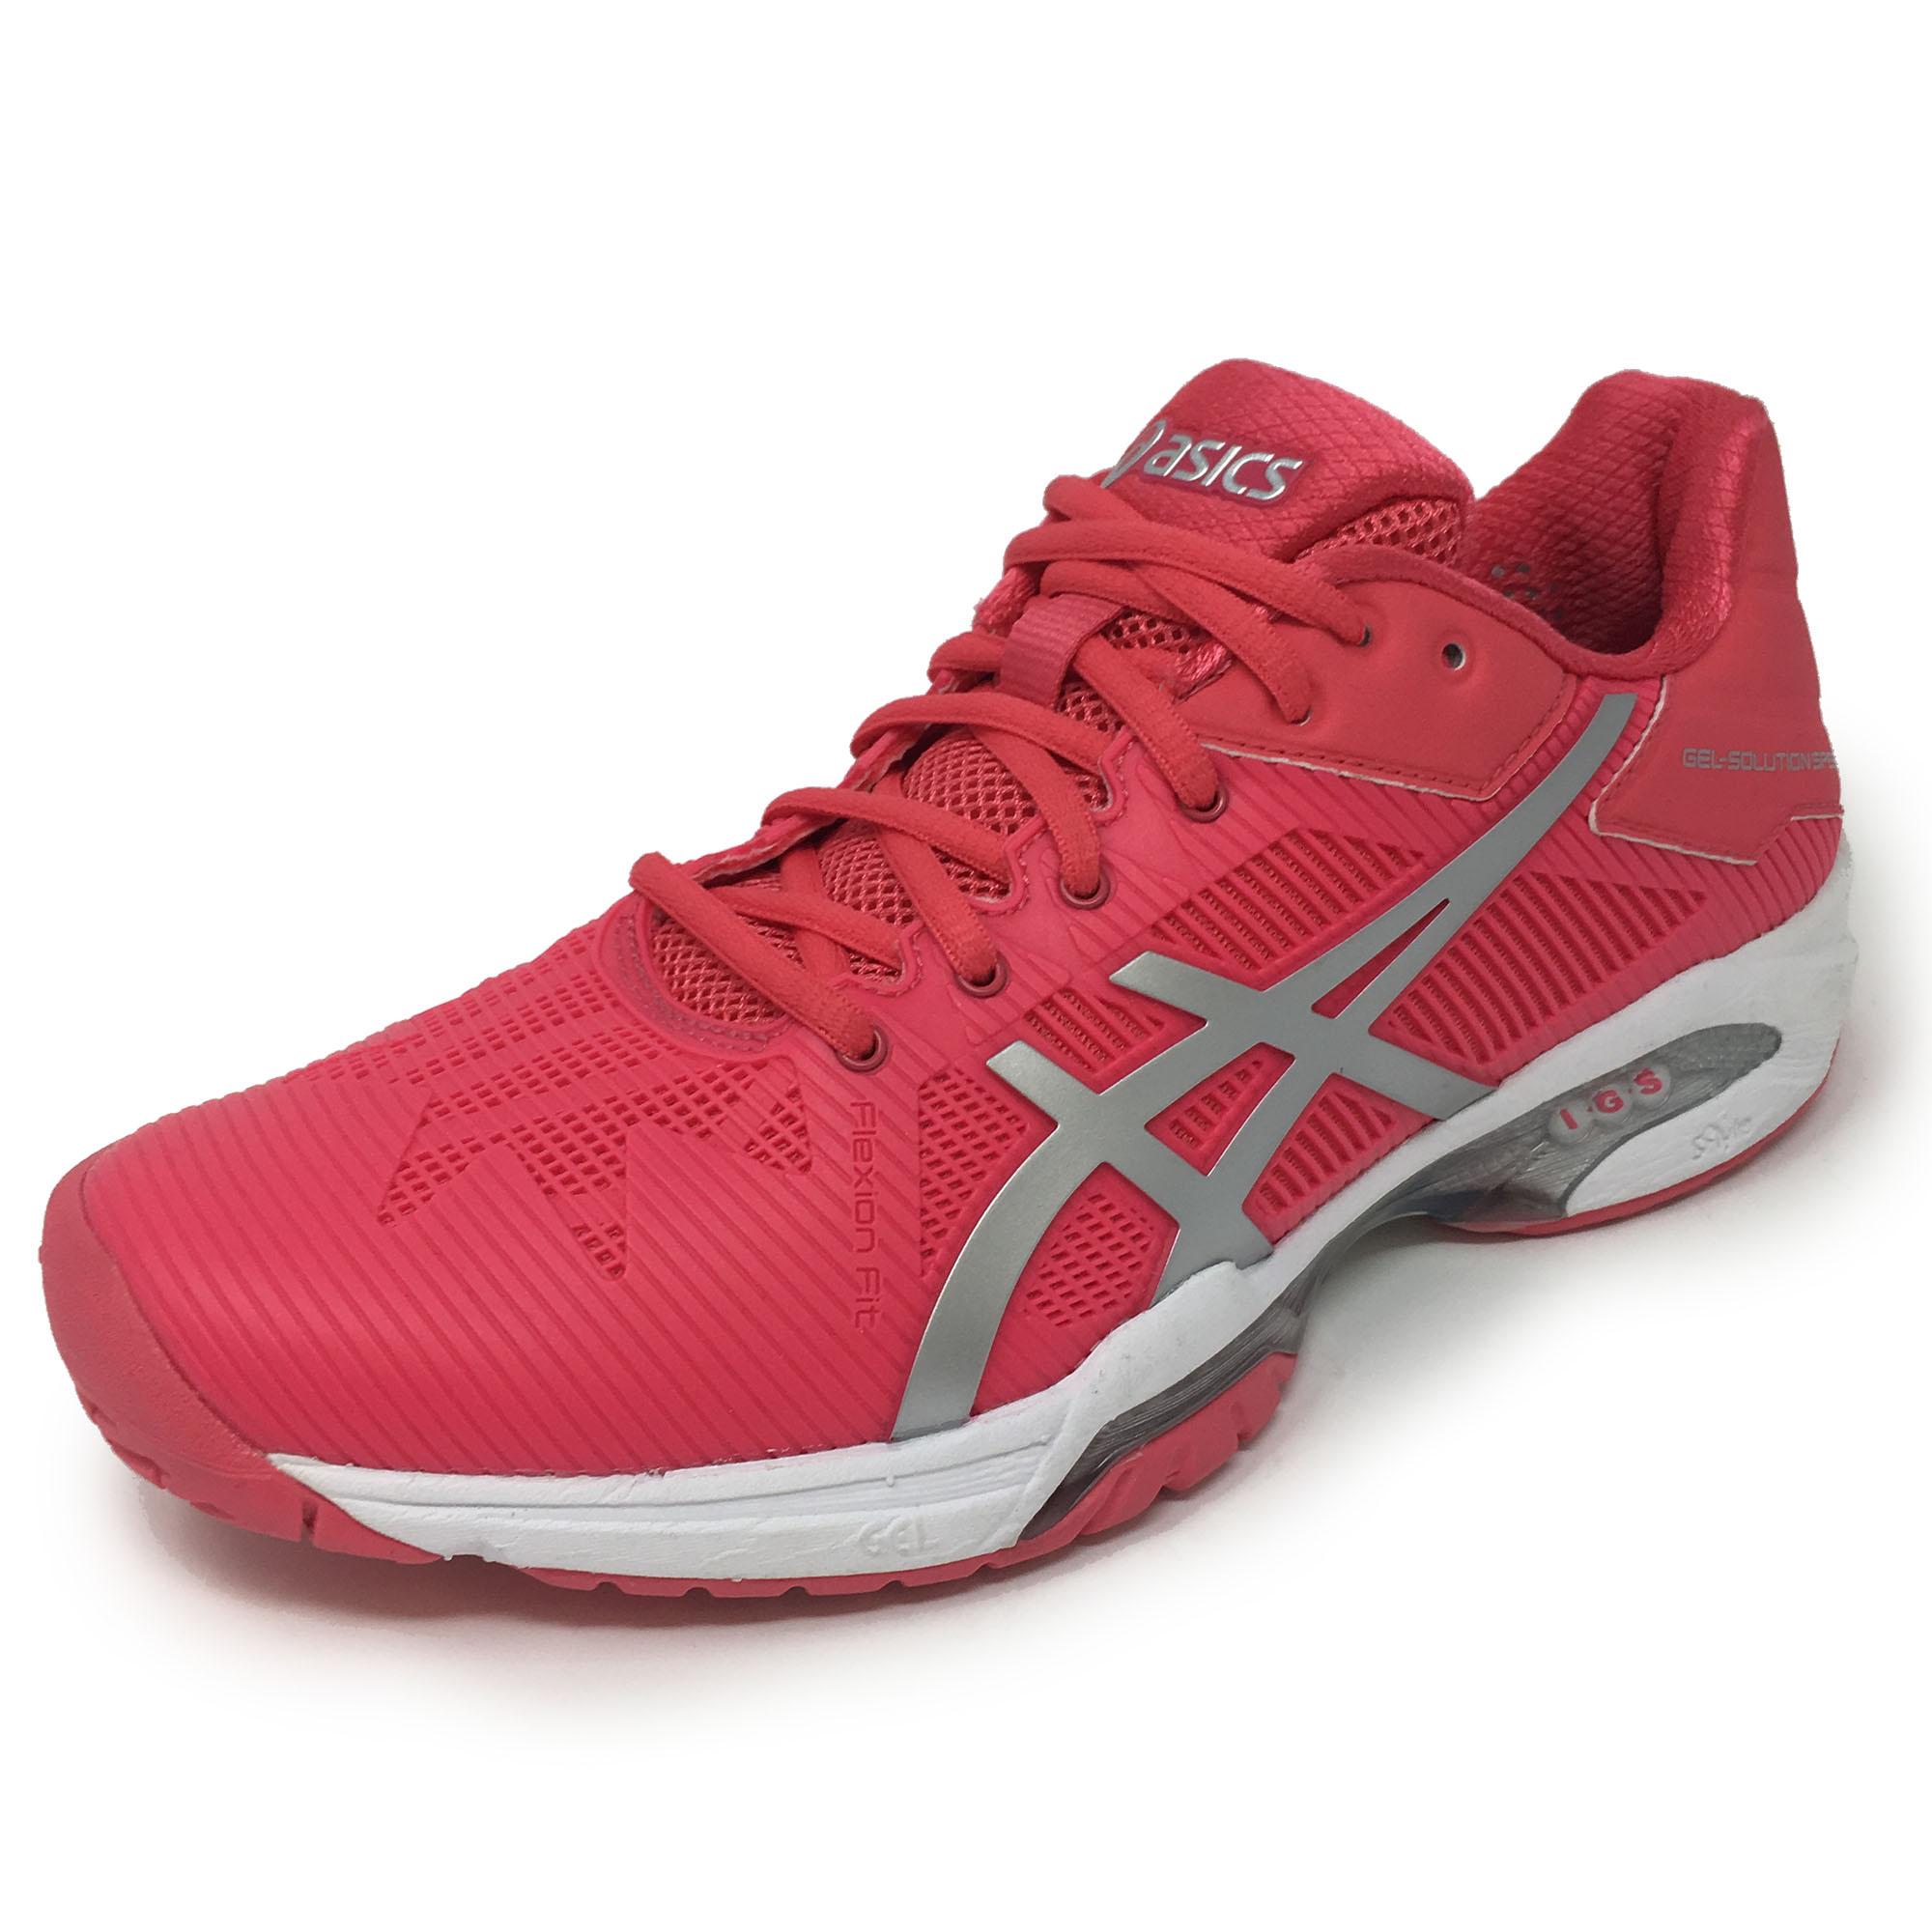 Asics GelSolution Speed 3 Ladies Tennis Shoes  Pink 4.5 UK